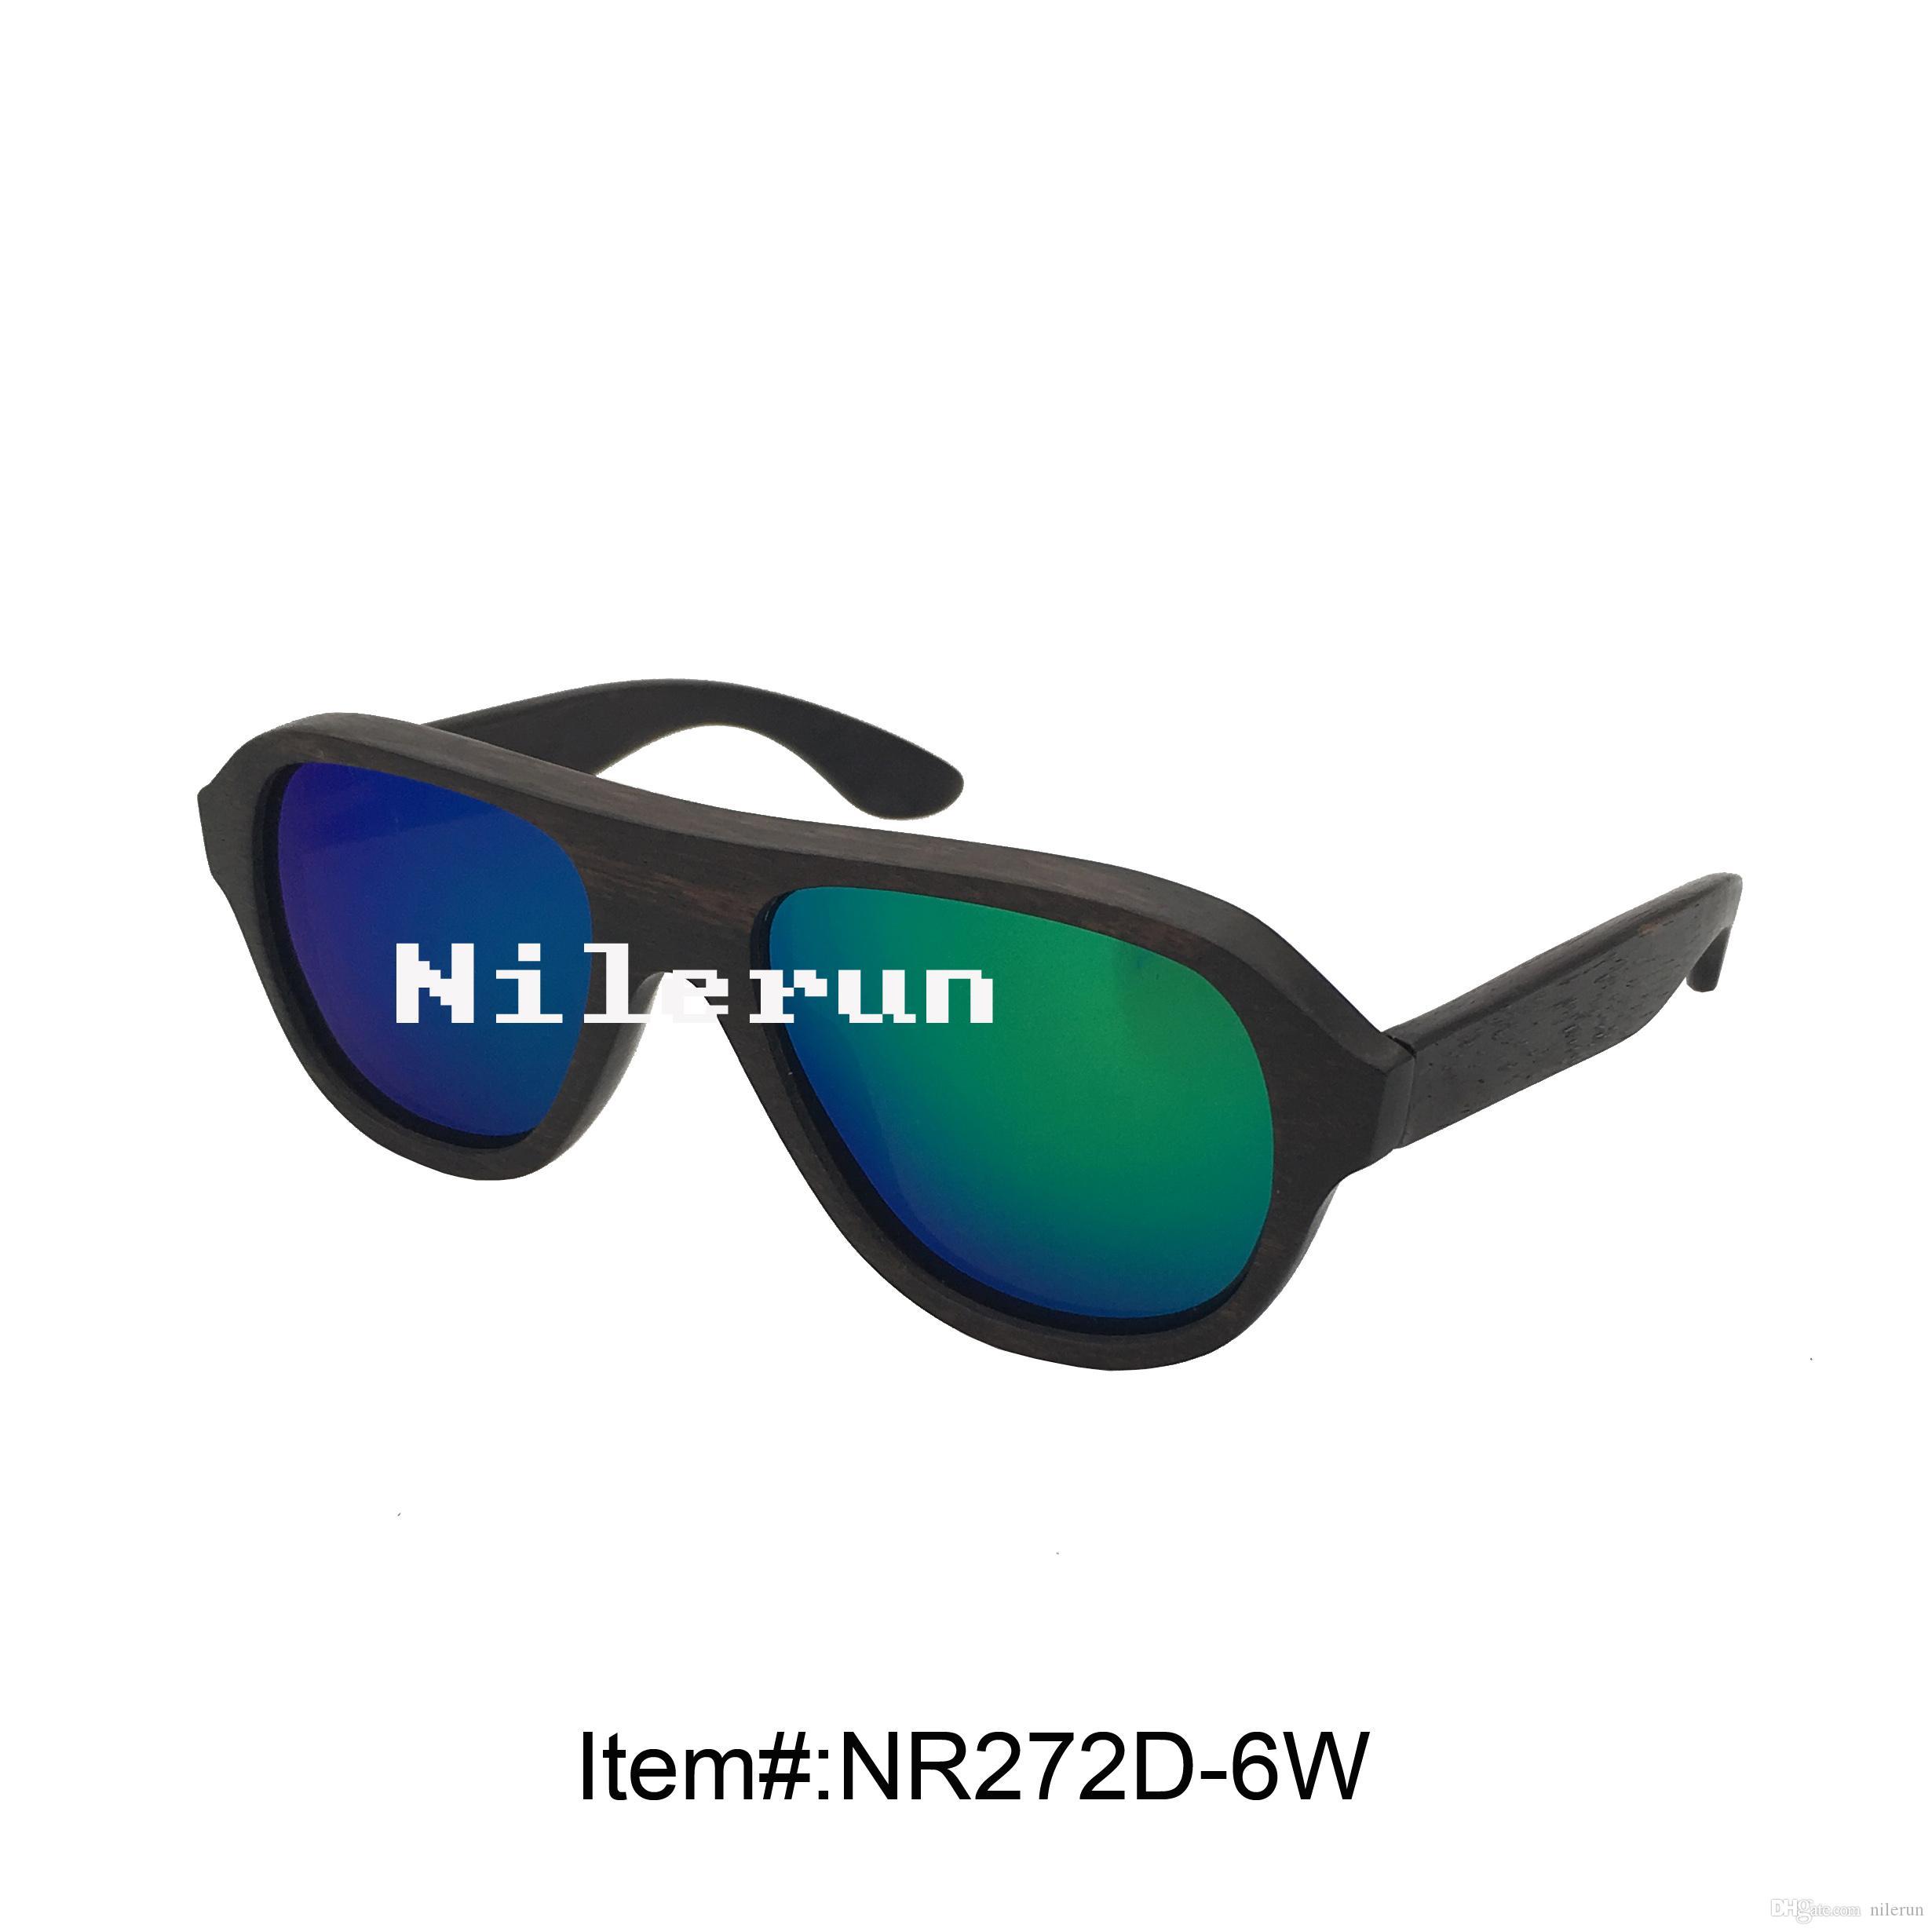 06515a0f1cb Fashion Unisex Green Lenses Ebony Wood Sunglasses Sport Sunglasses  Prescription Sunglasses Online From Nilerun